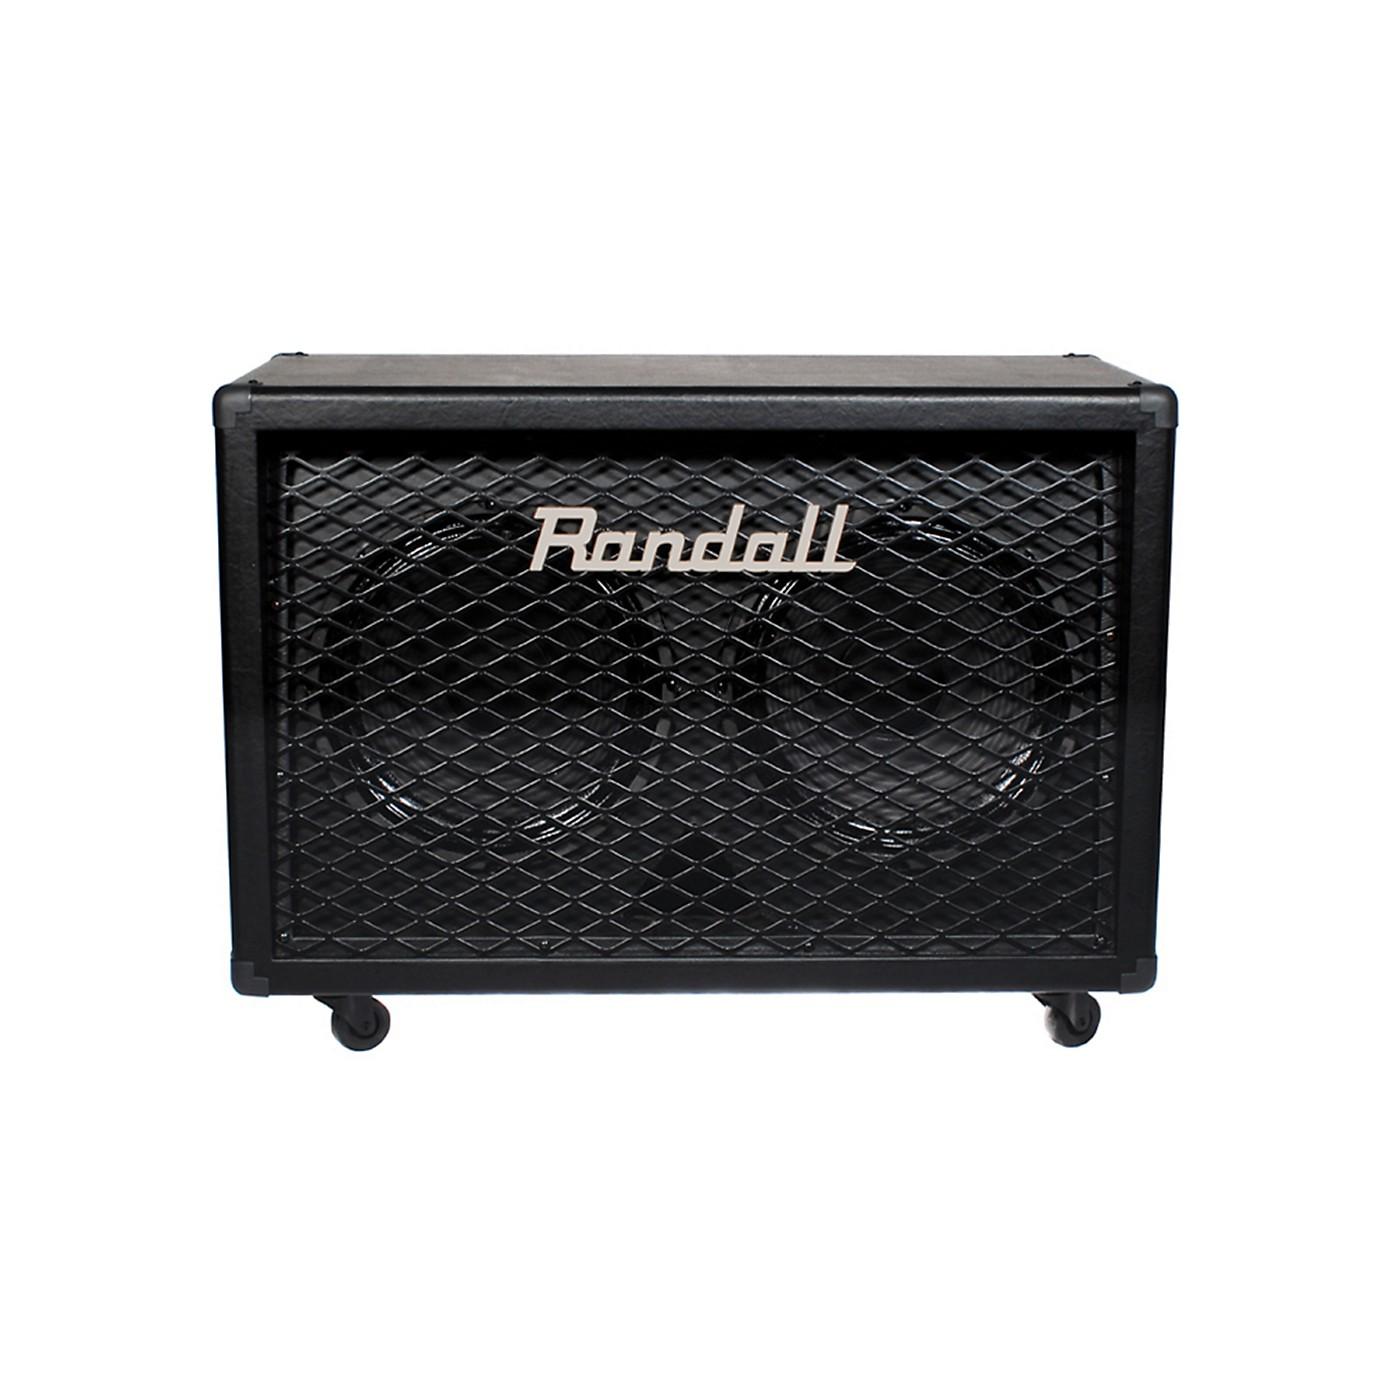 Randall RD212-V30 Diavlo 2X12 Angled Guitar Cab thumbnail